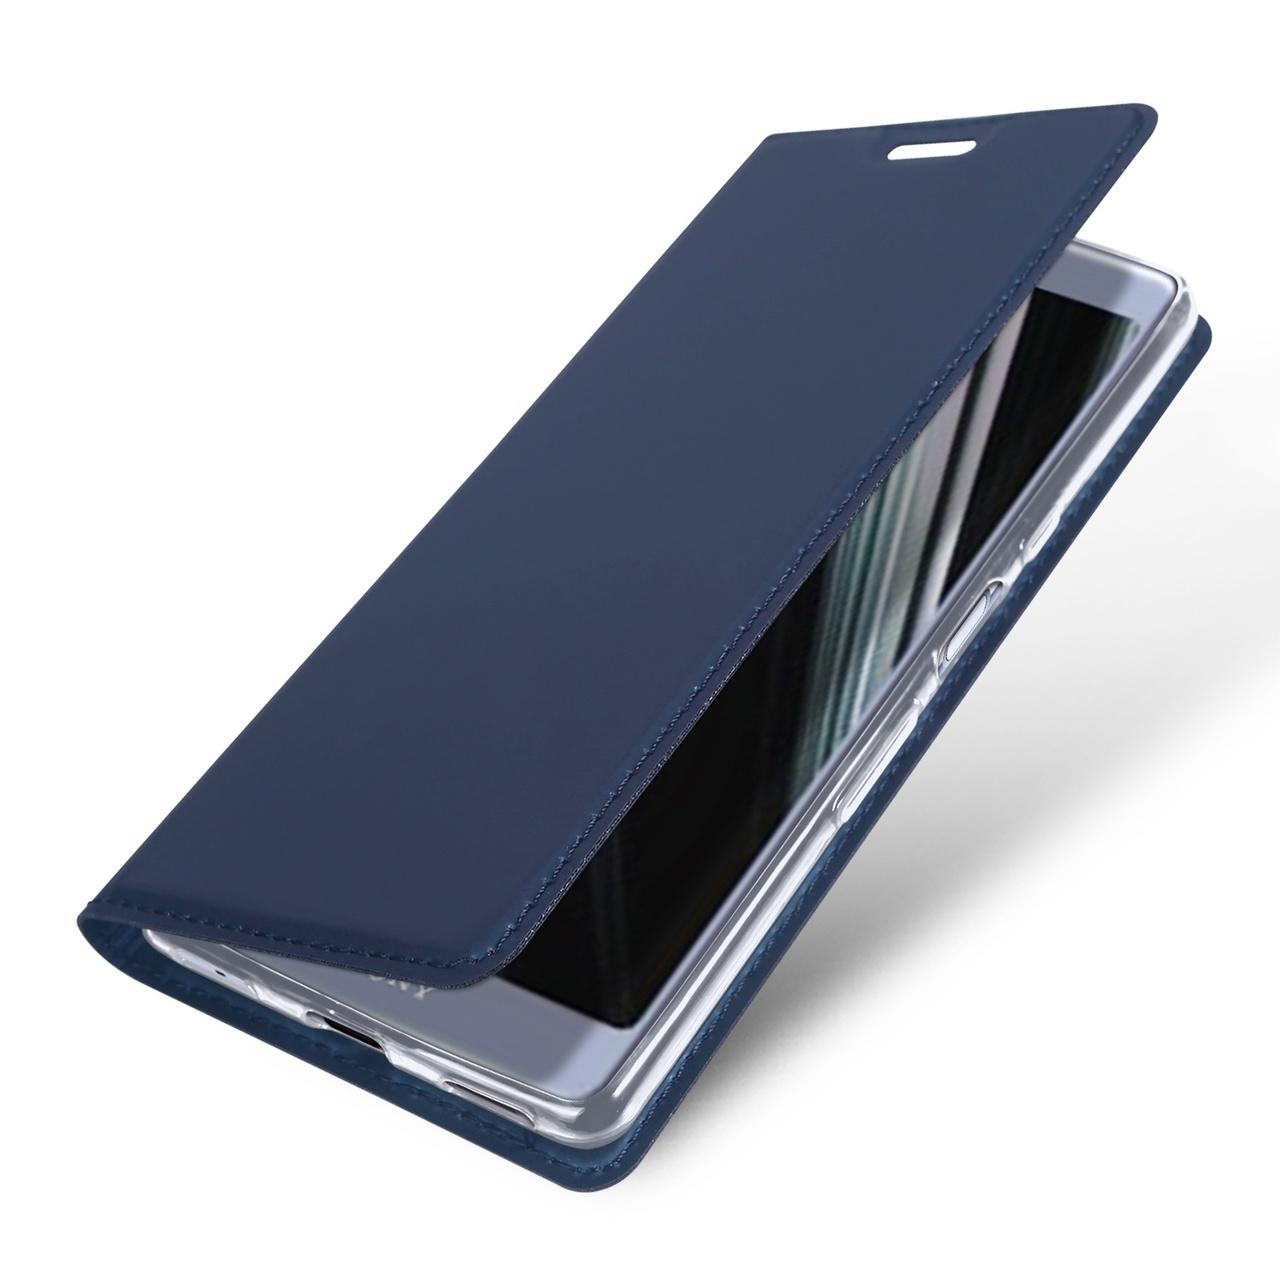 f89f63c907c Sony Xperia L3 Cover Sony Xperia L3 Case Cover Holder Blue ...